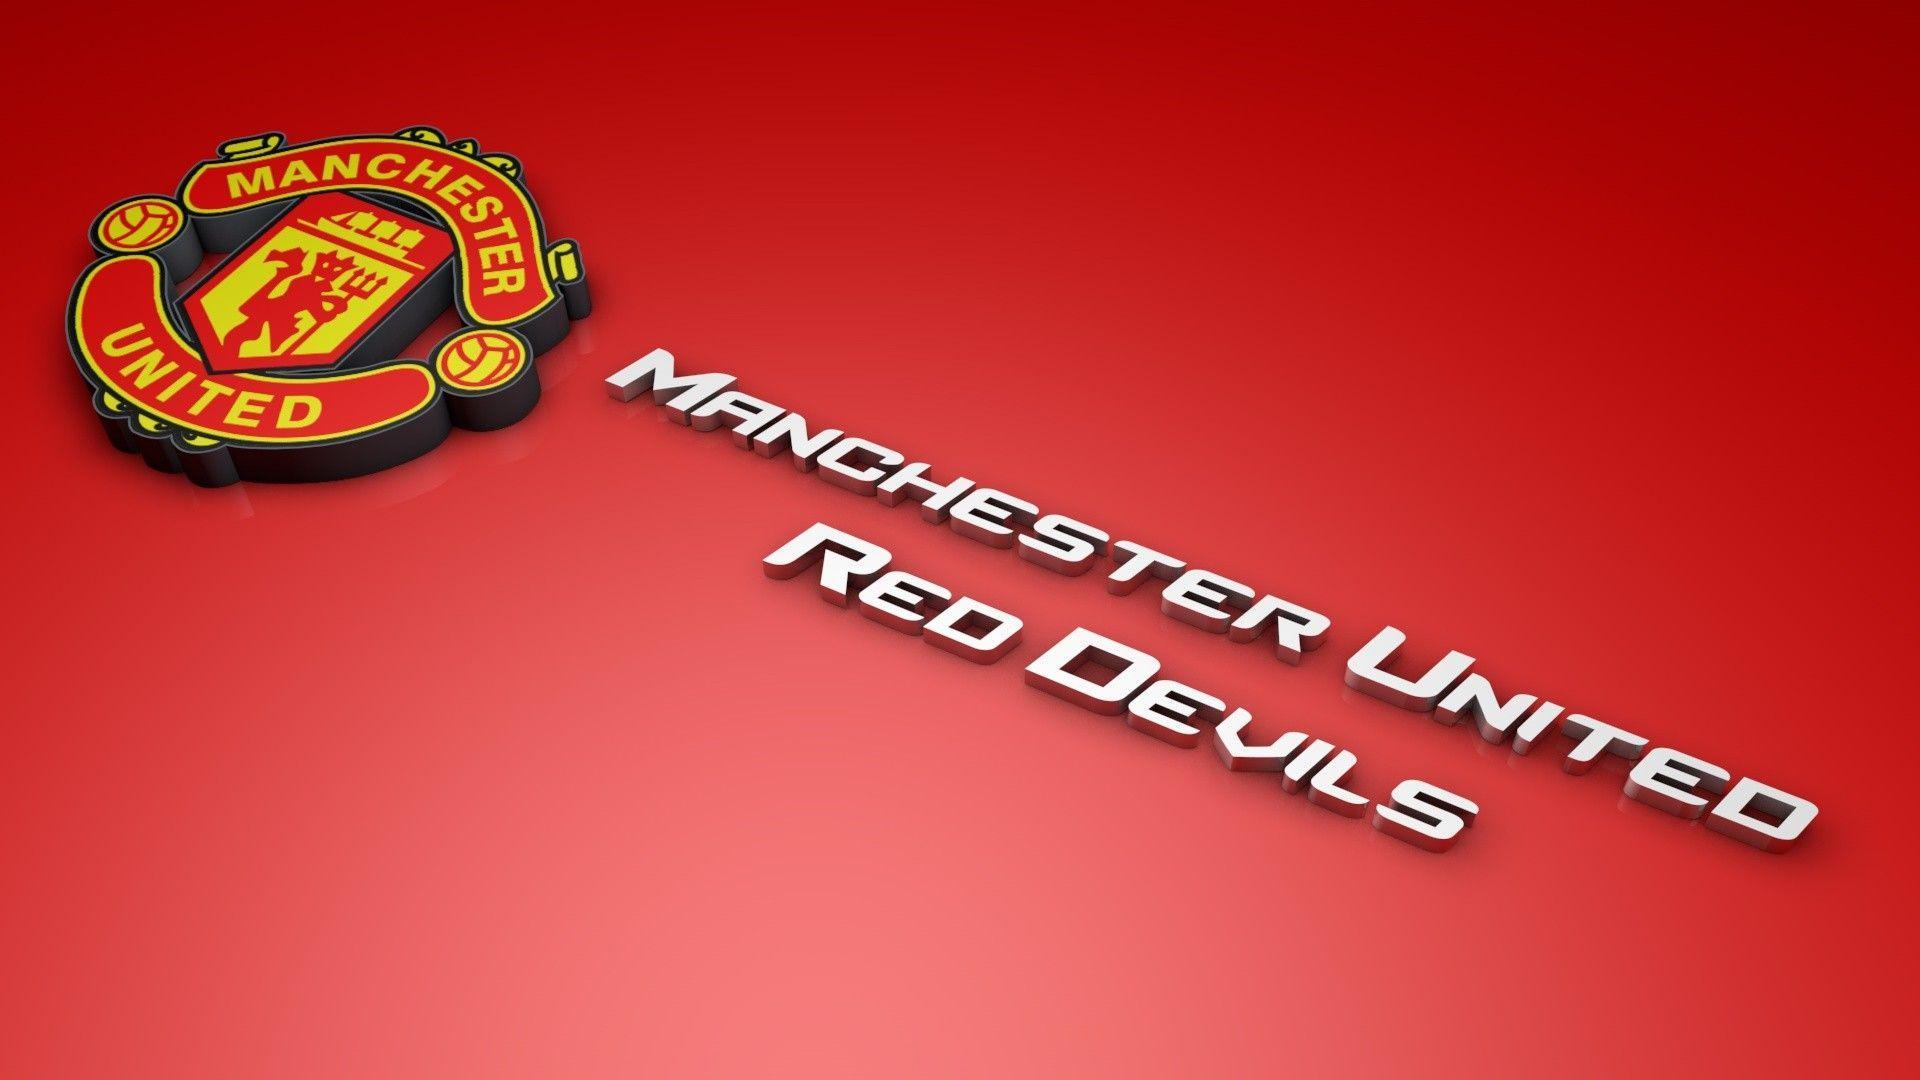 Unduh 100+ Wallpaper Bergerak Manchester United  Paling Baru